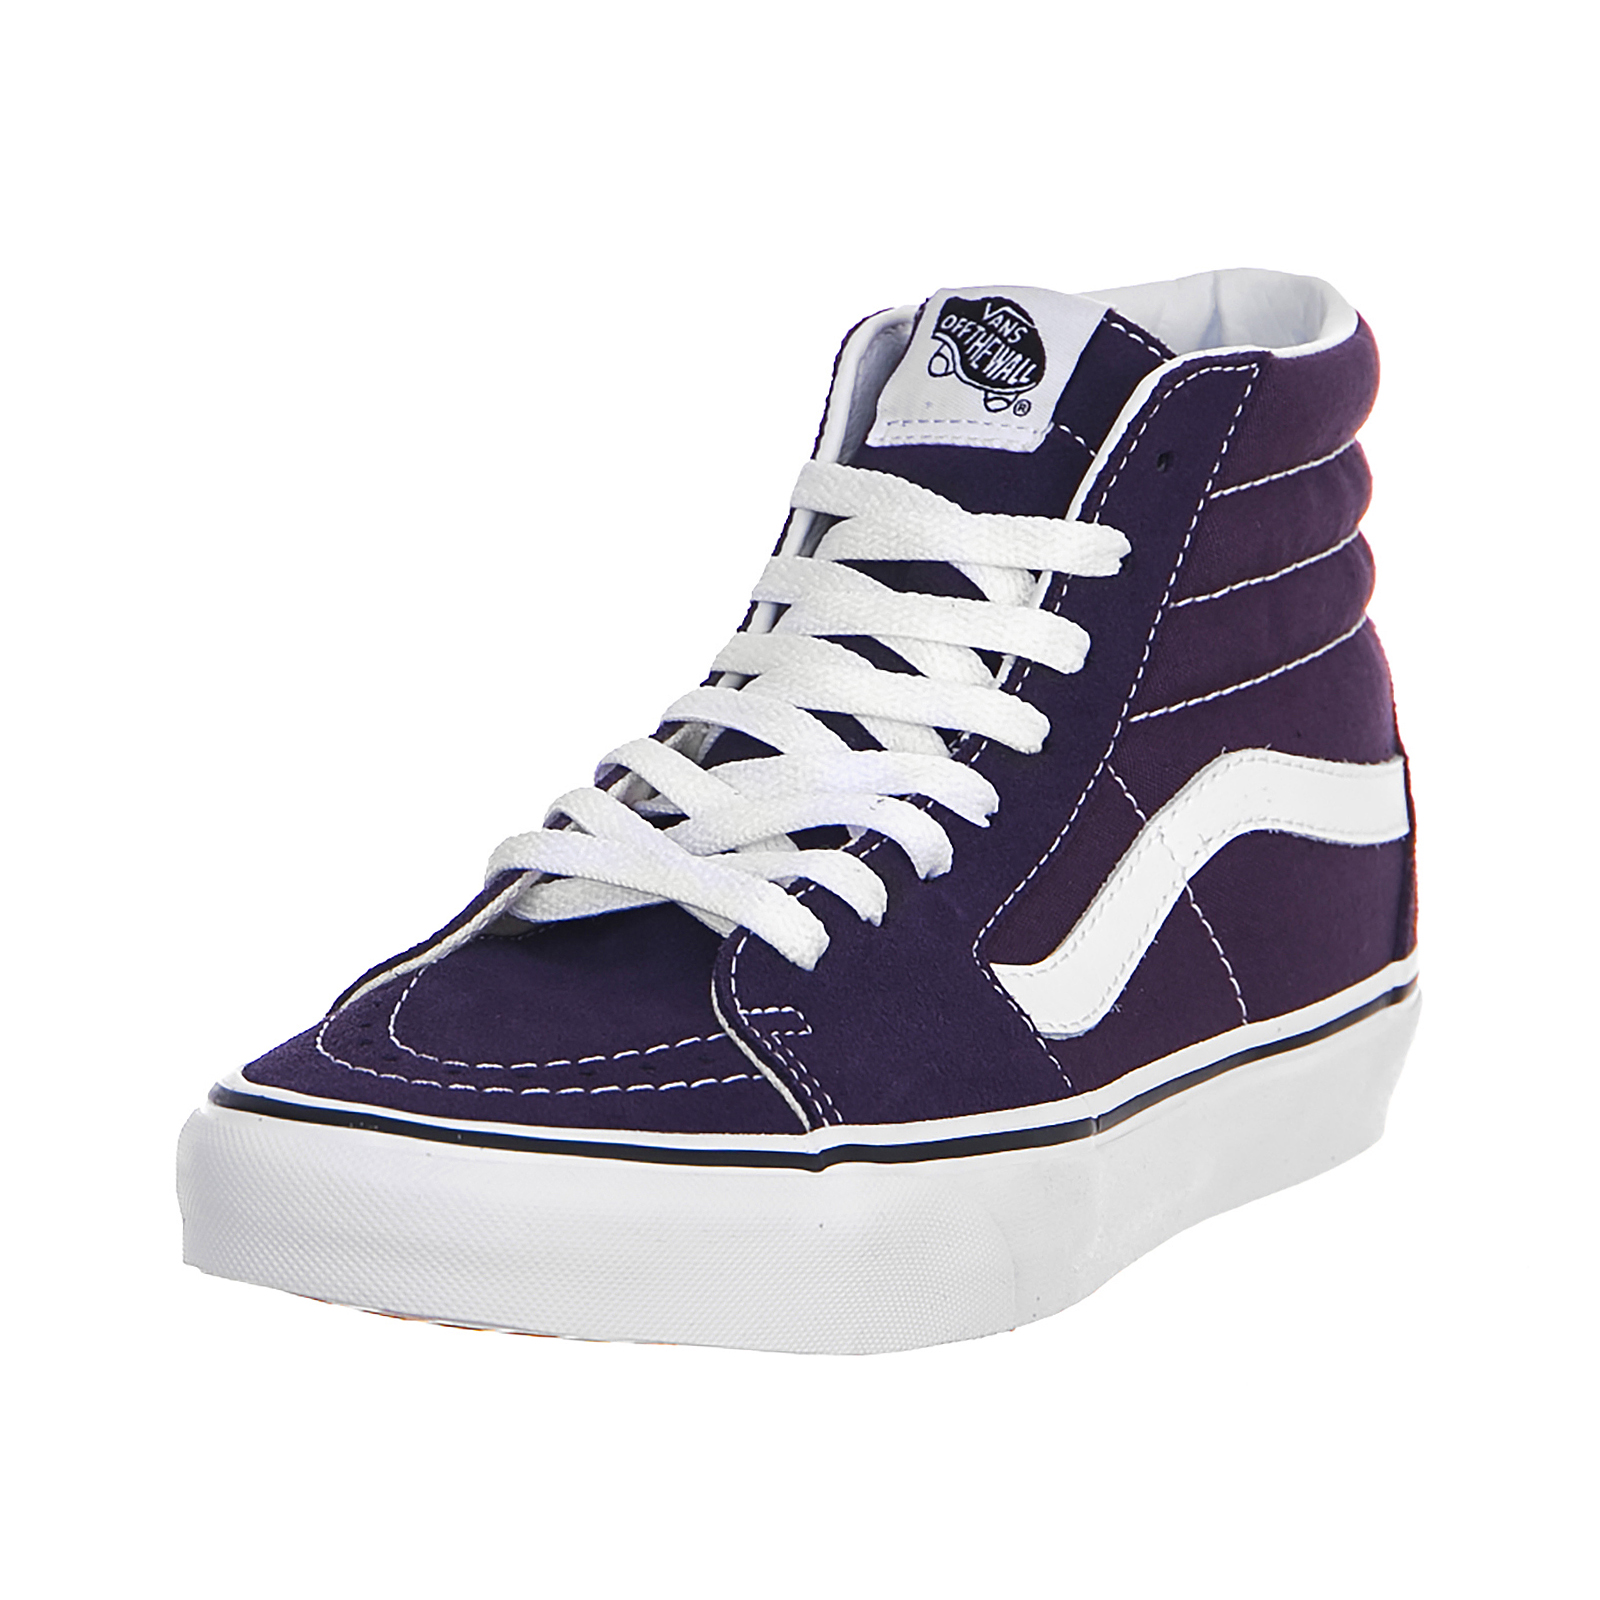 Vans Viola Sk8 Nightshade t hi Sneakers Ua 1qZ1fSR